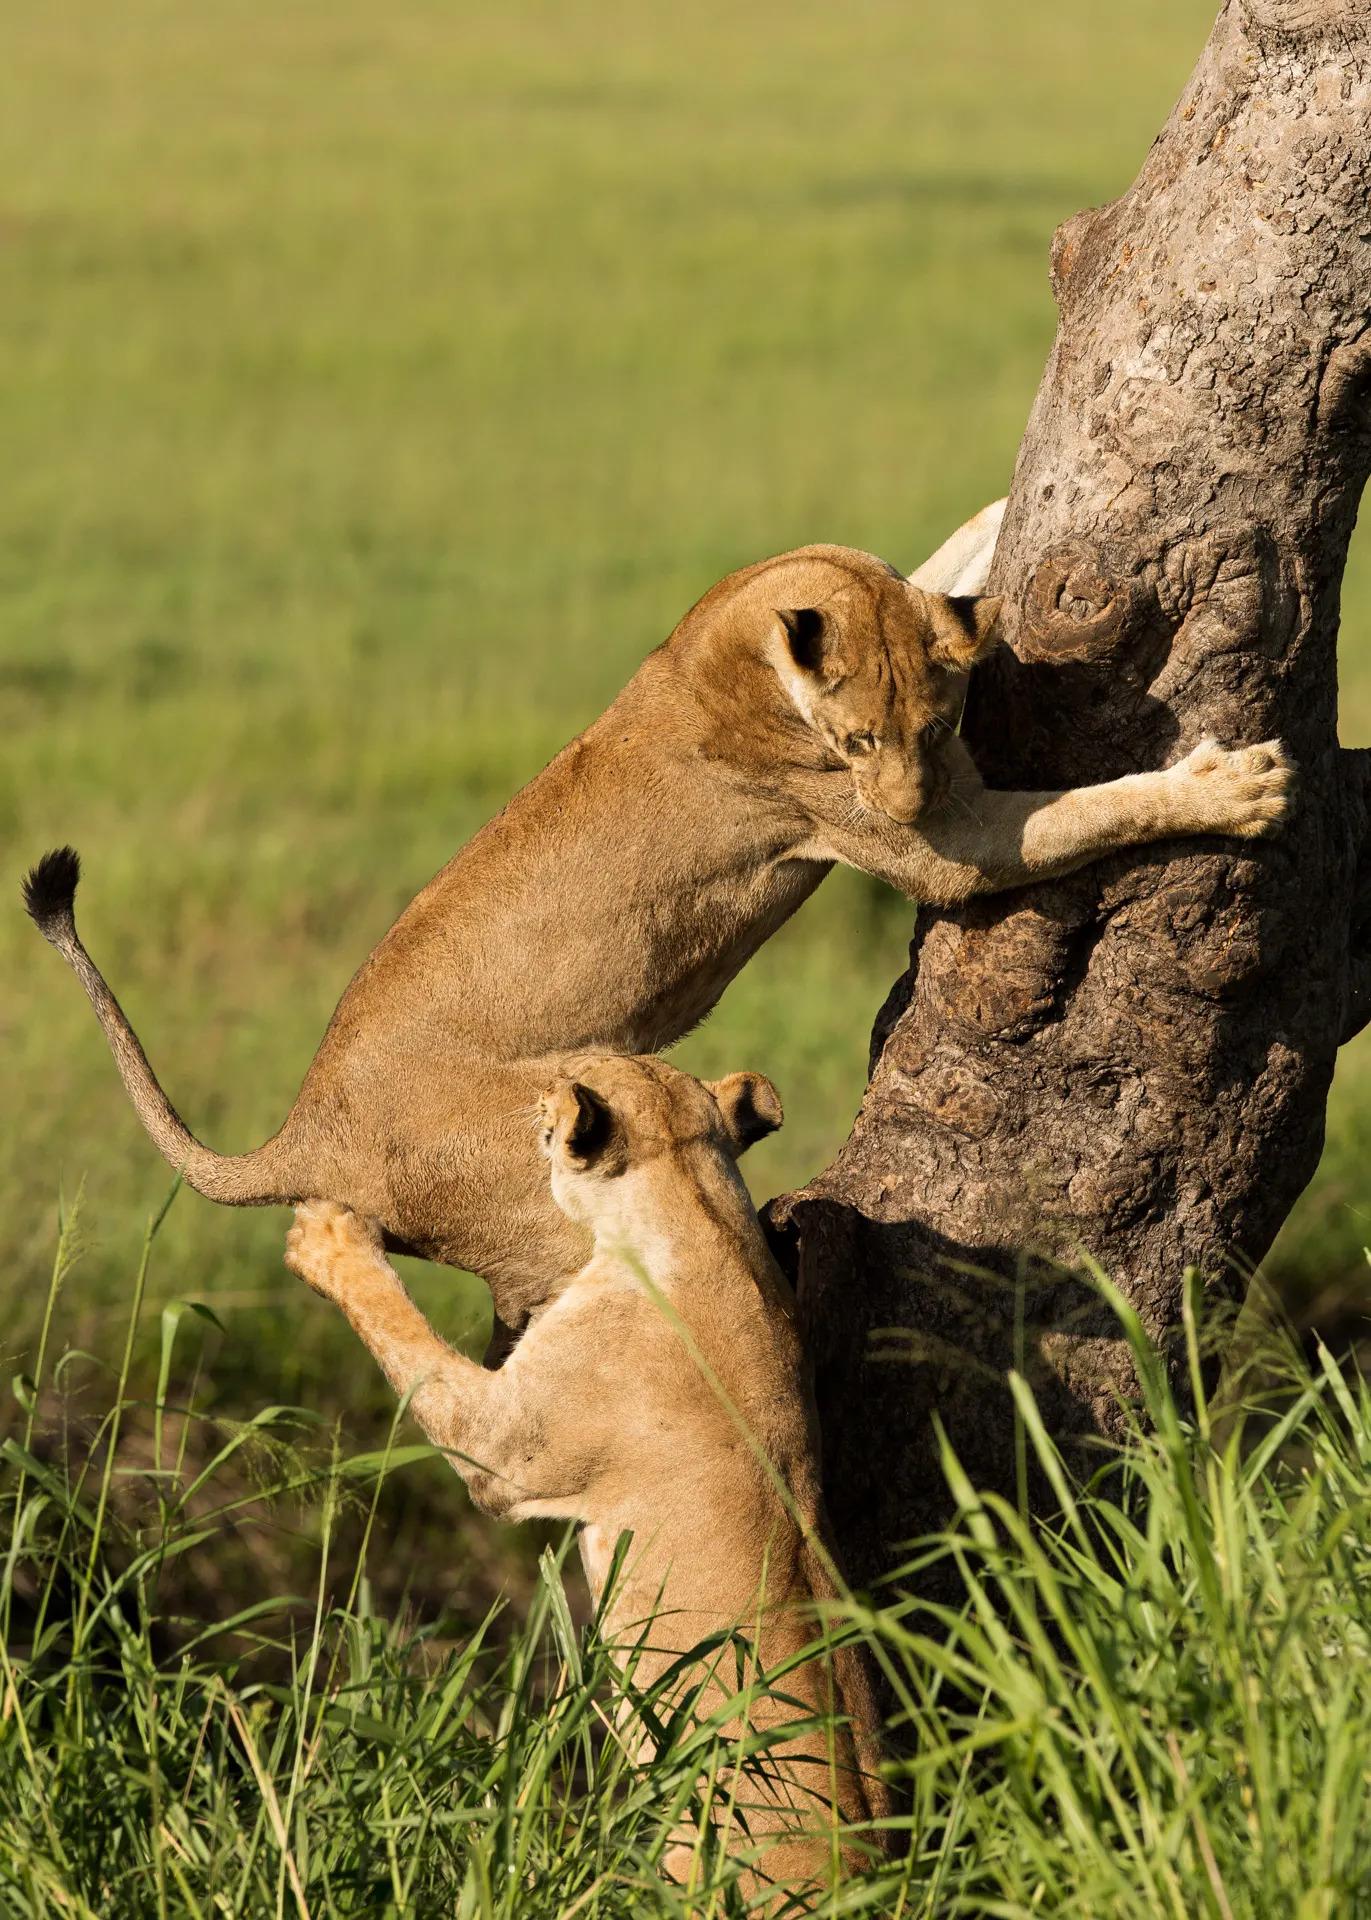 Lion climbing tree 3